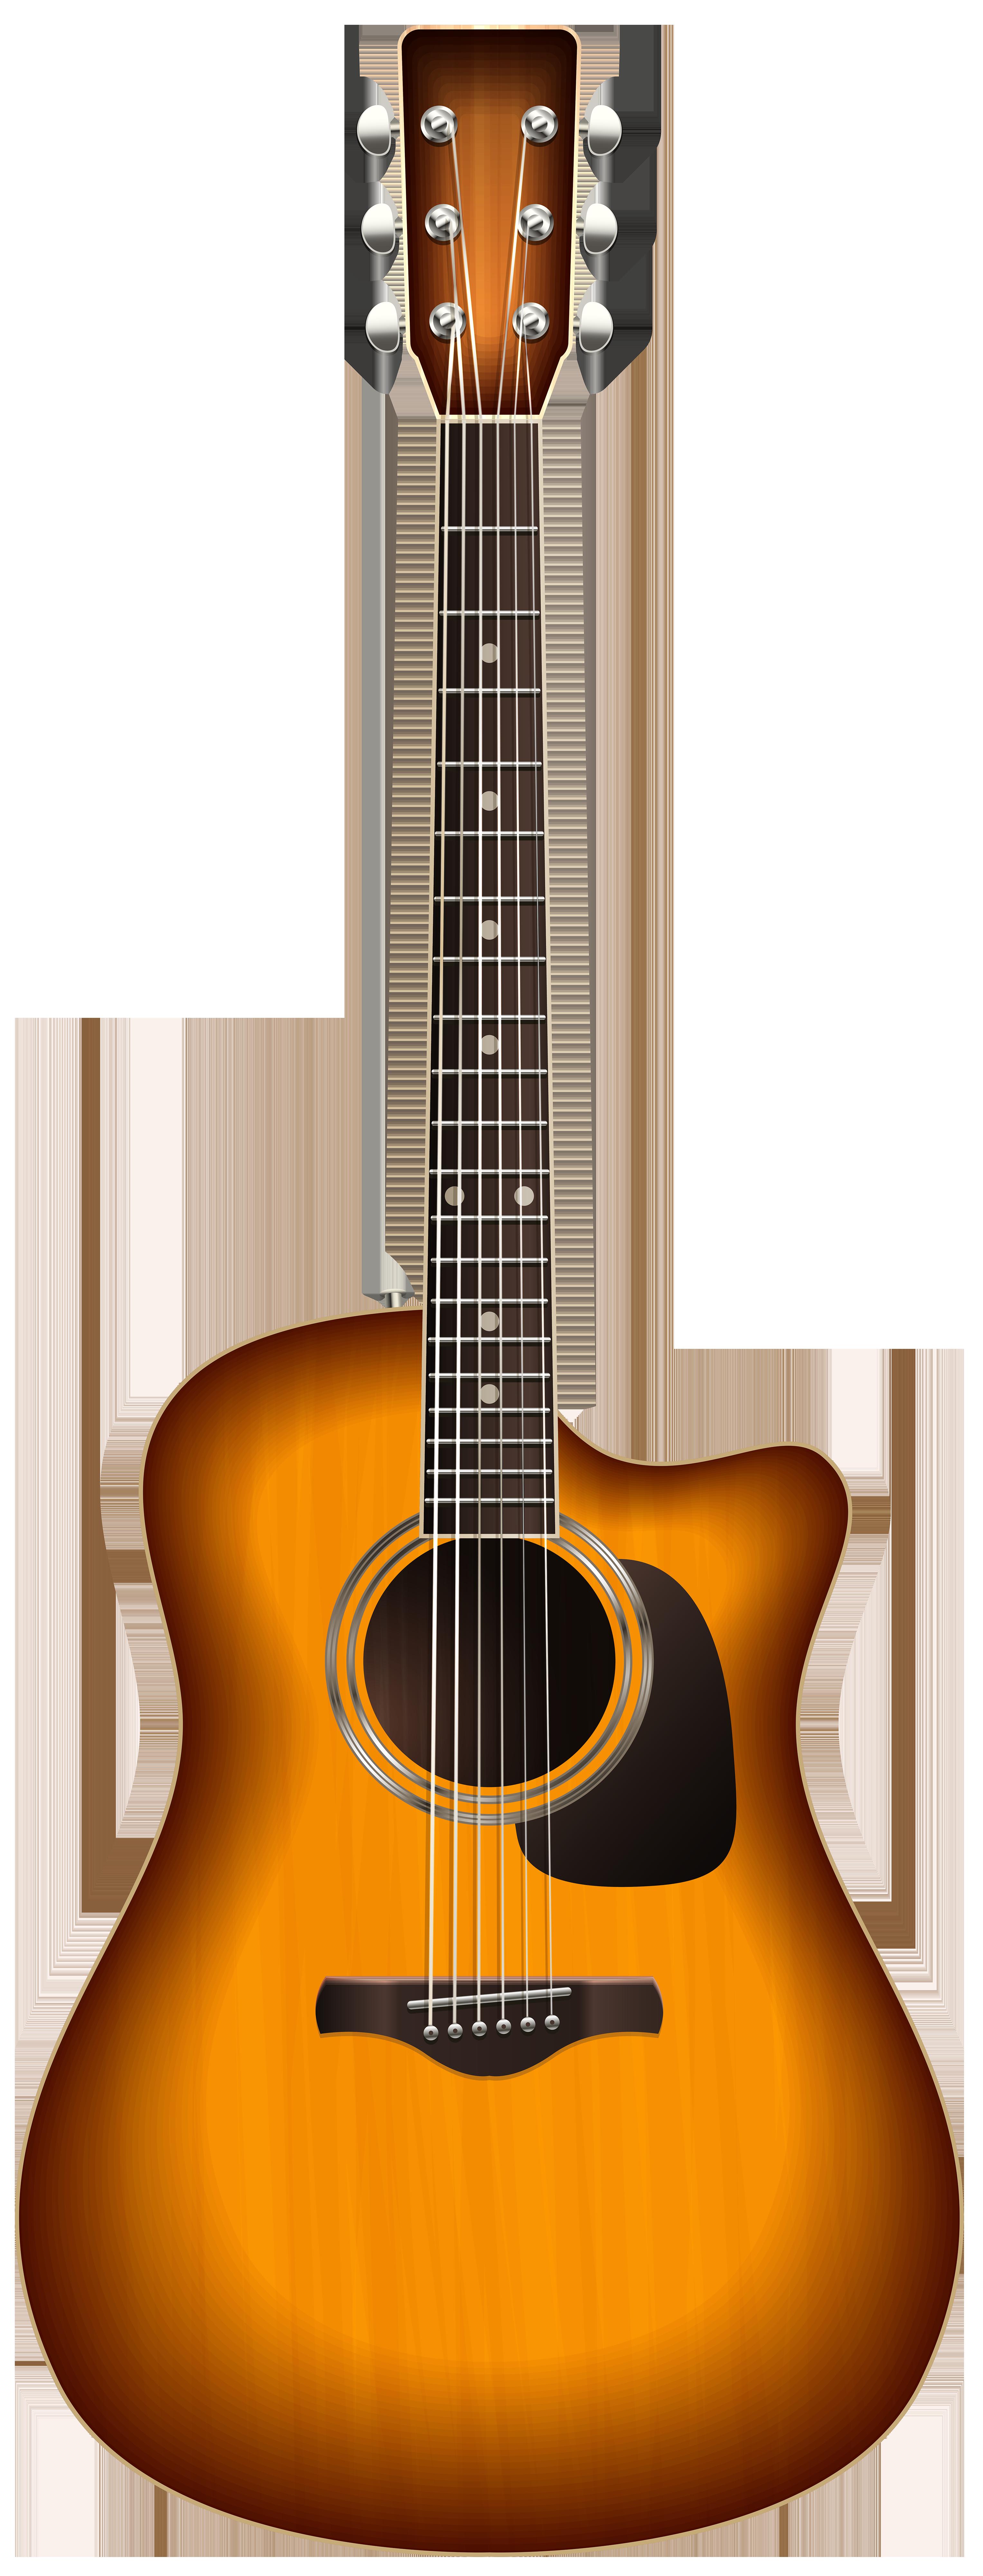 graphic free download Acoustic clipart guita. Guitar png transparent clip